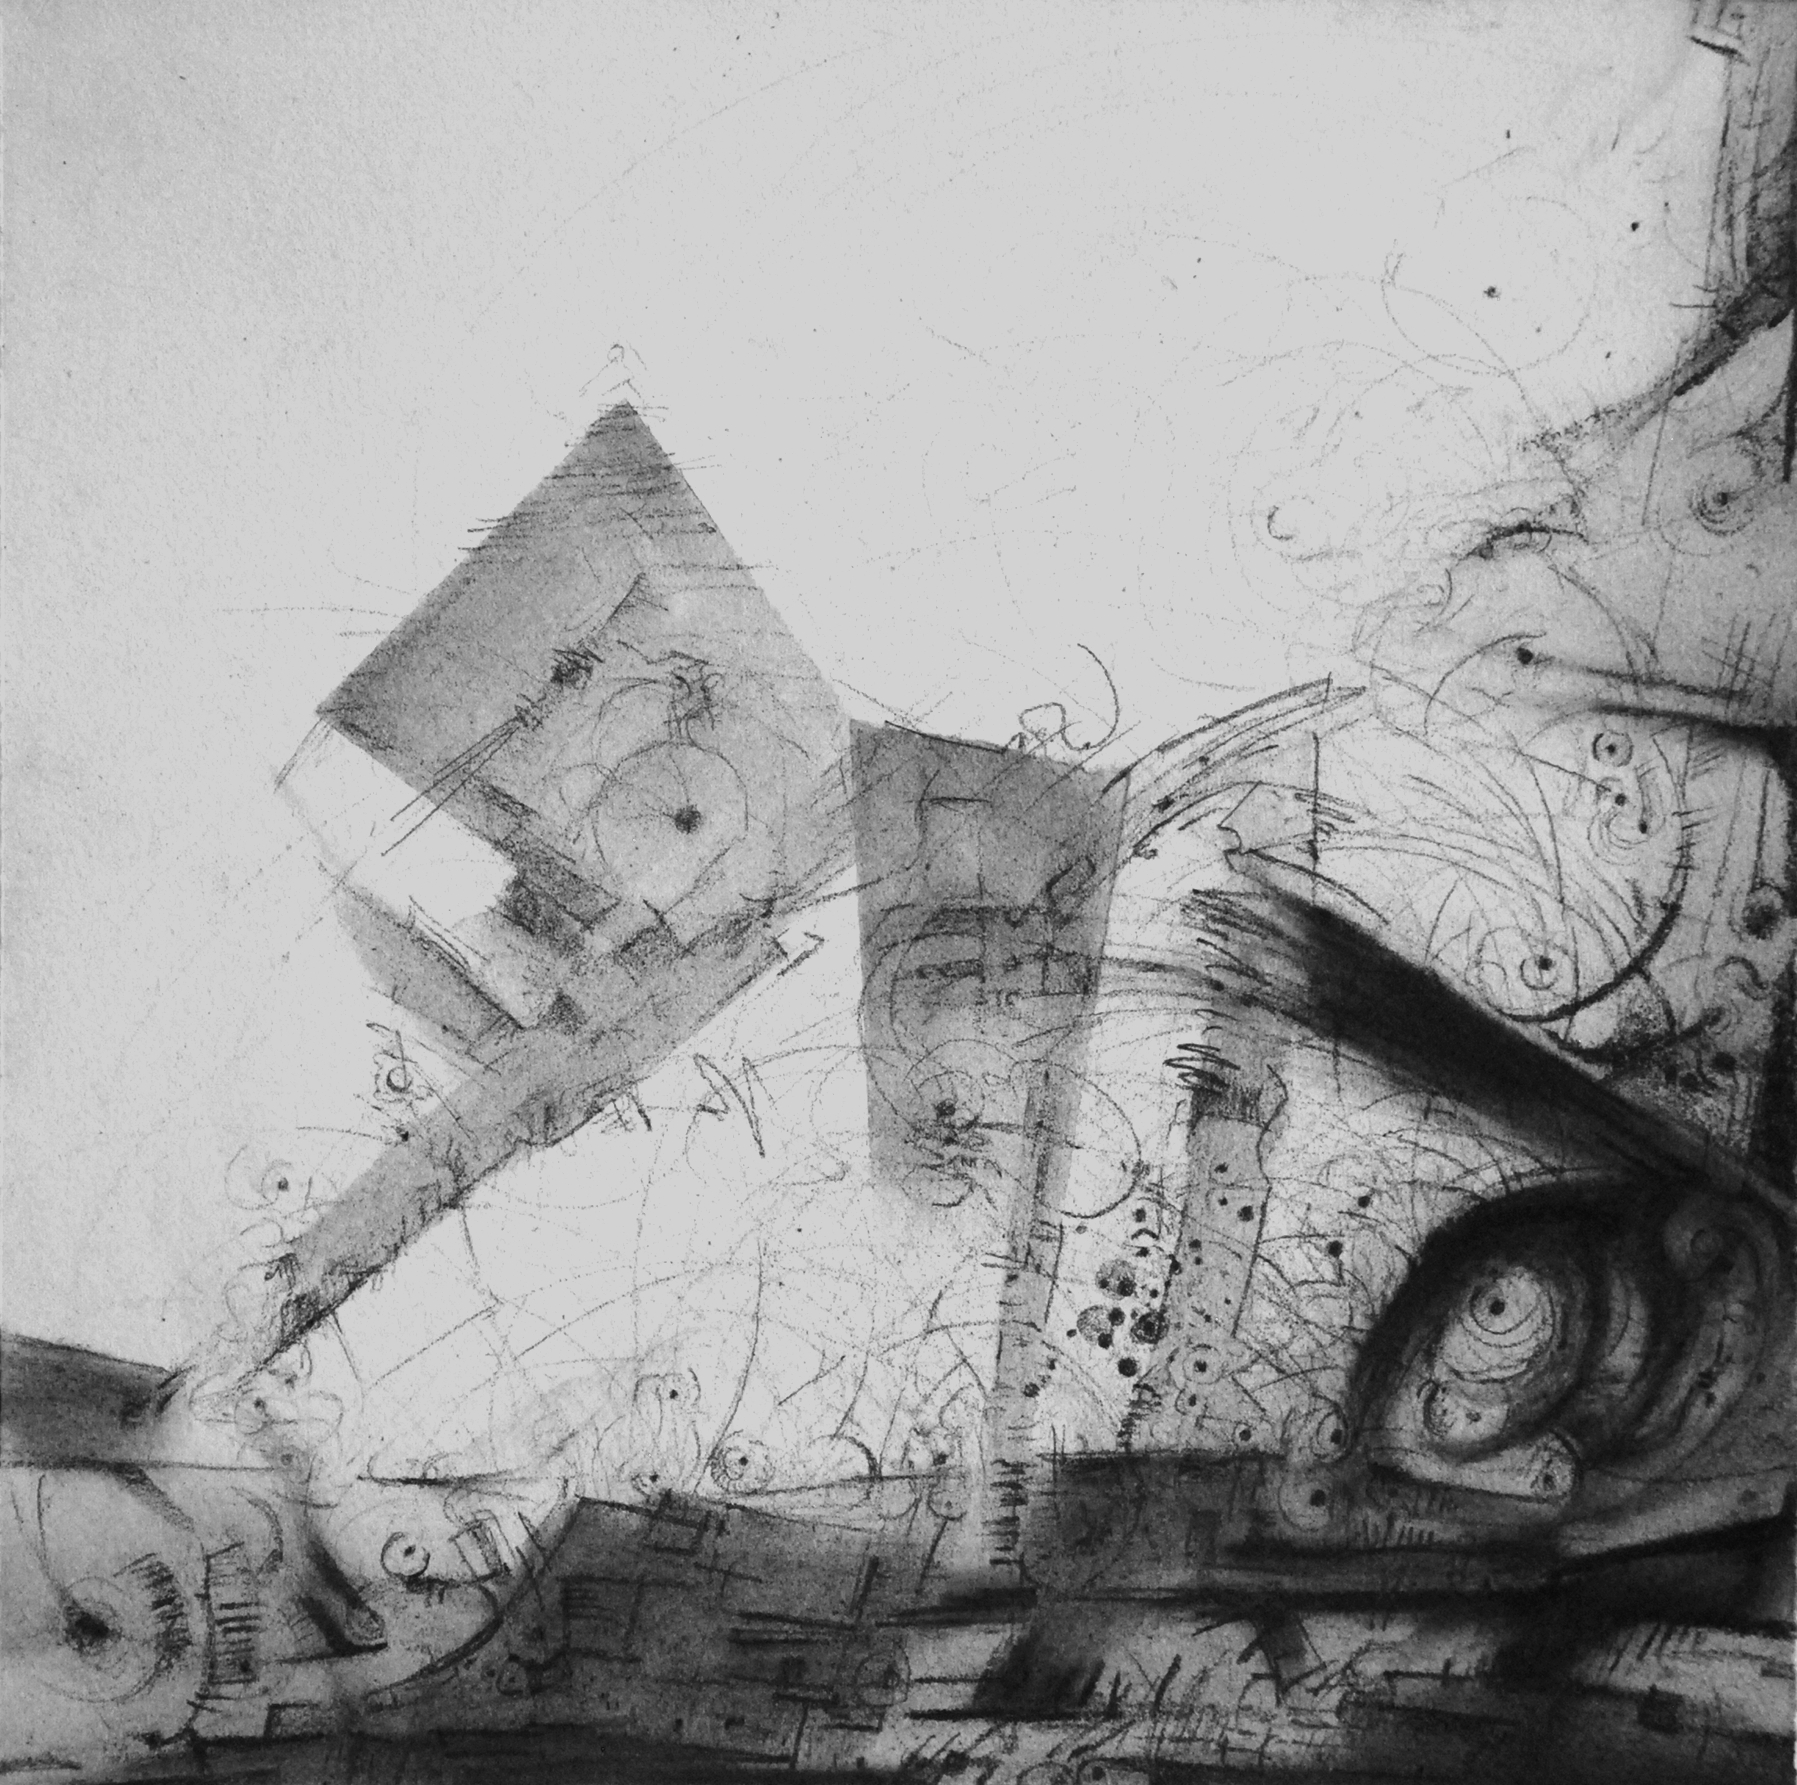 "Intercession IX, 12"" x 12"", Graphite on Rives, 2013"